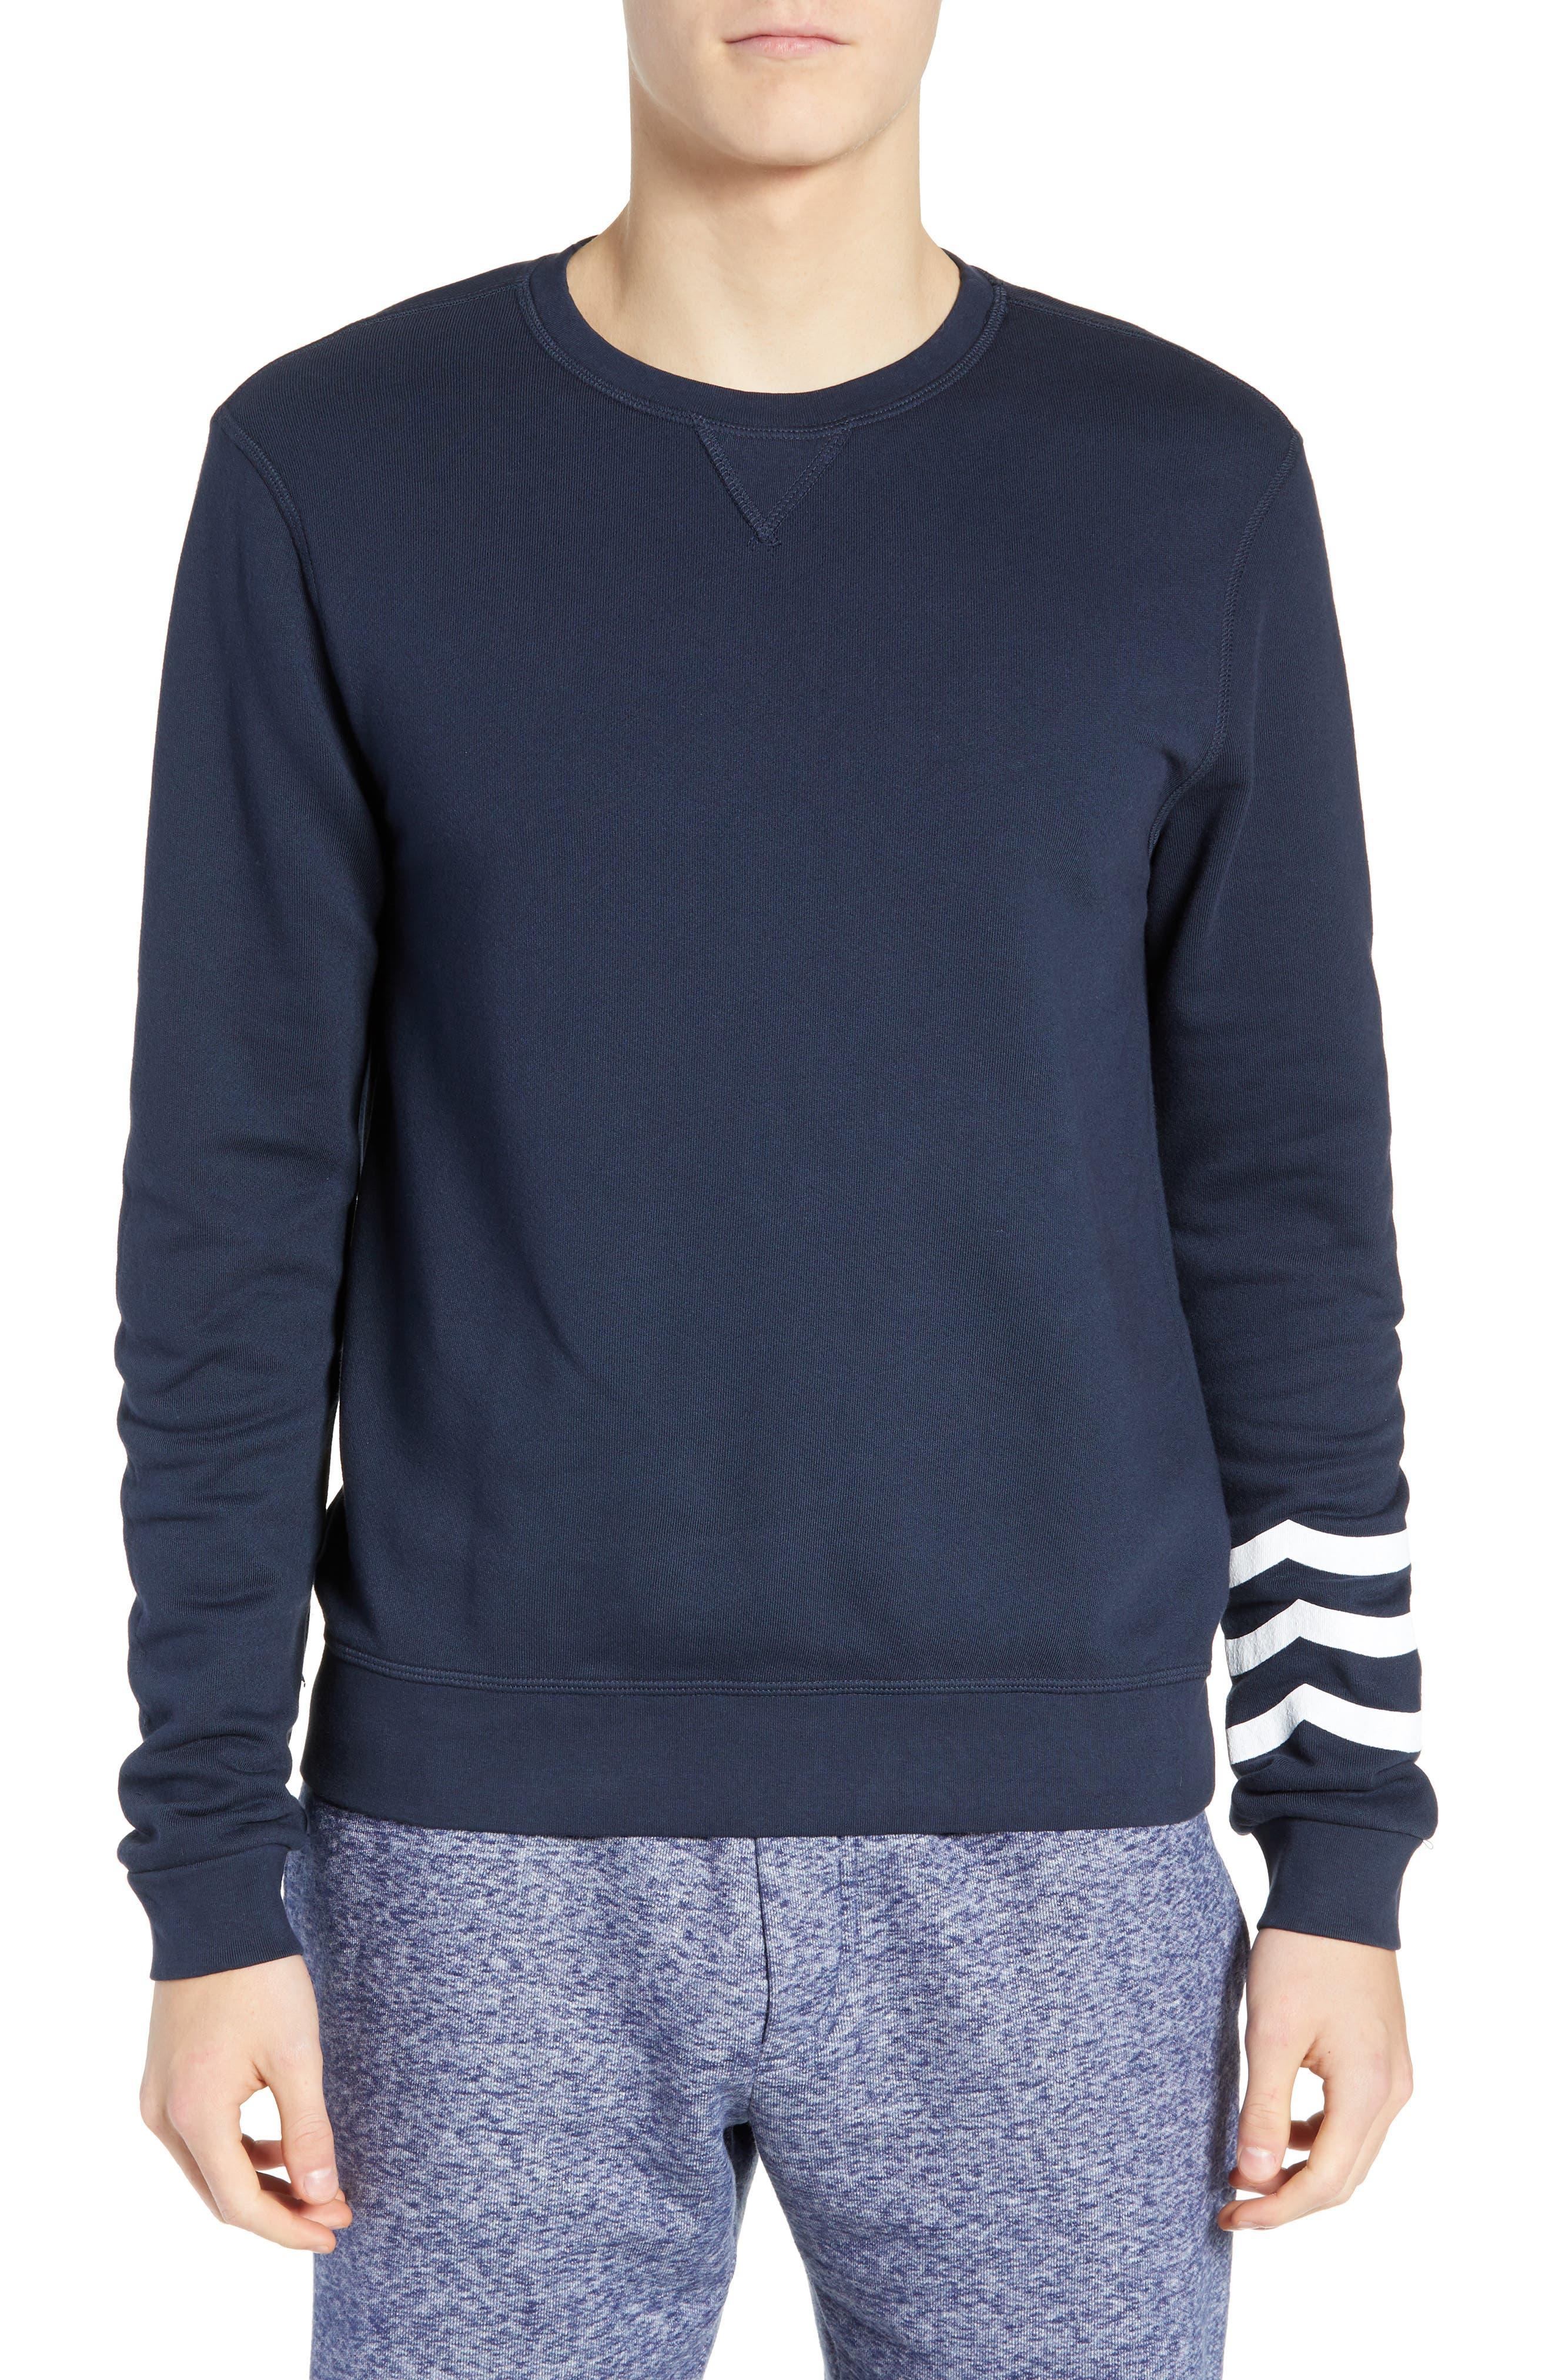 SOL ANGELES Essential Crewneck Sweatshirt in Indigo